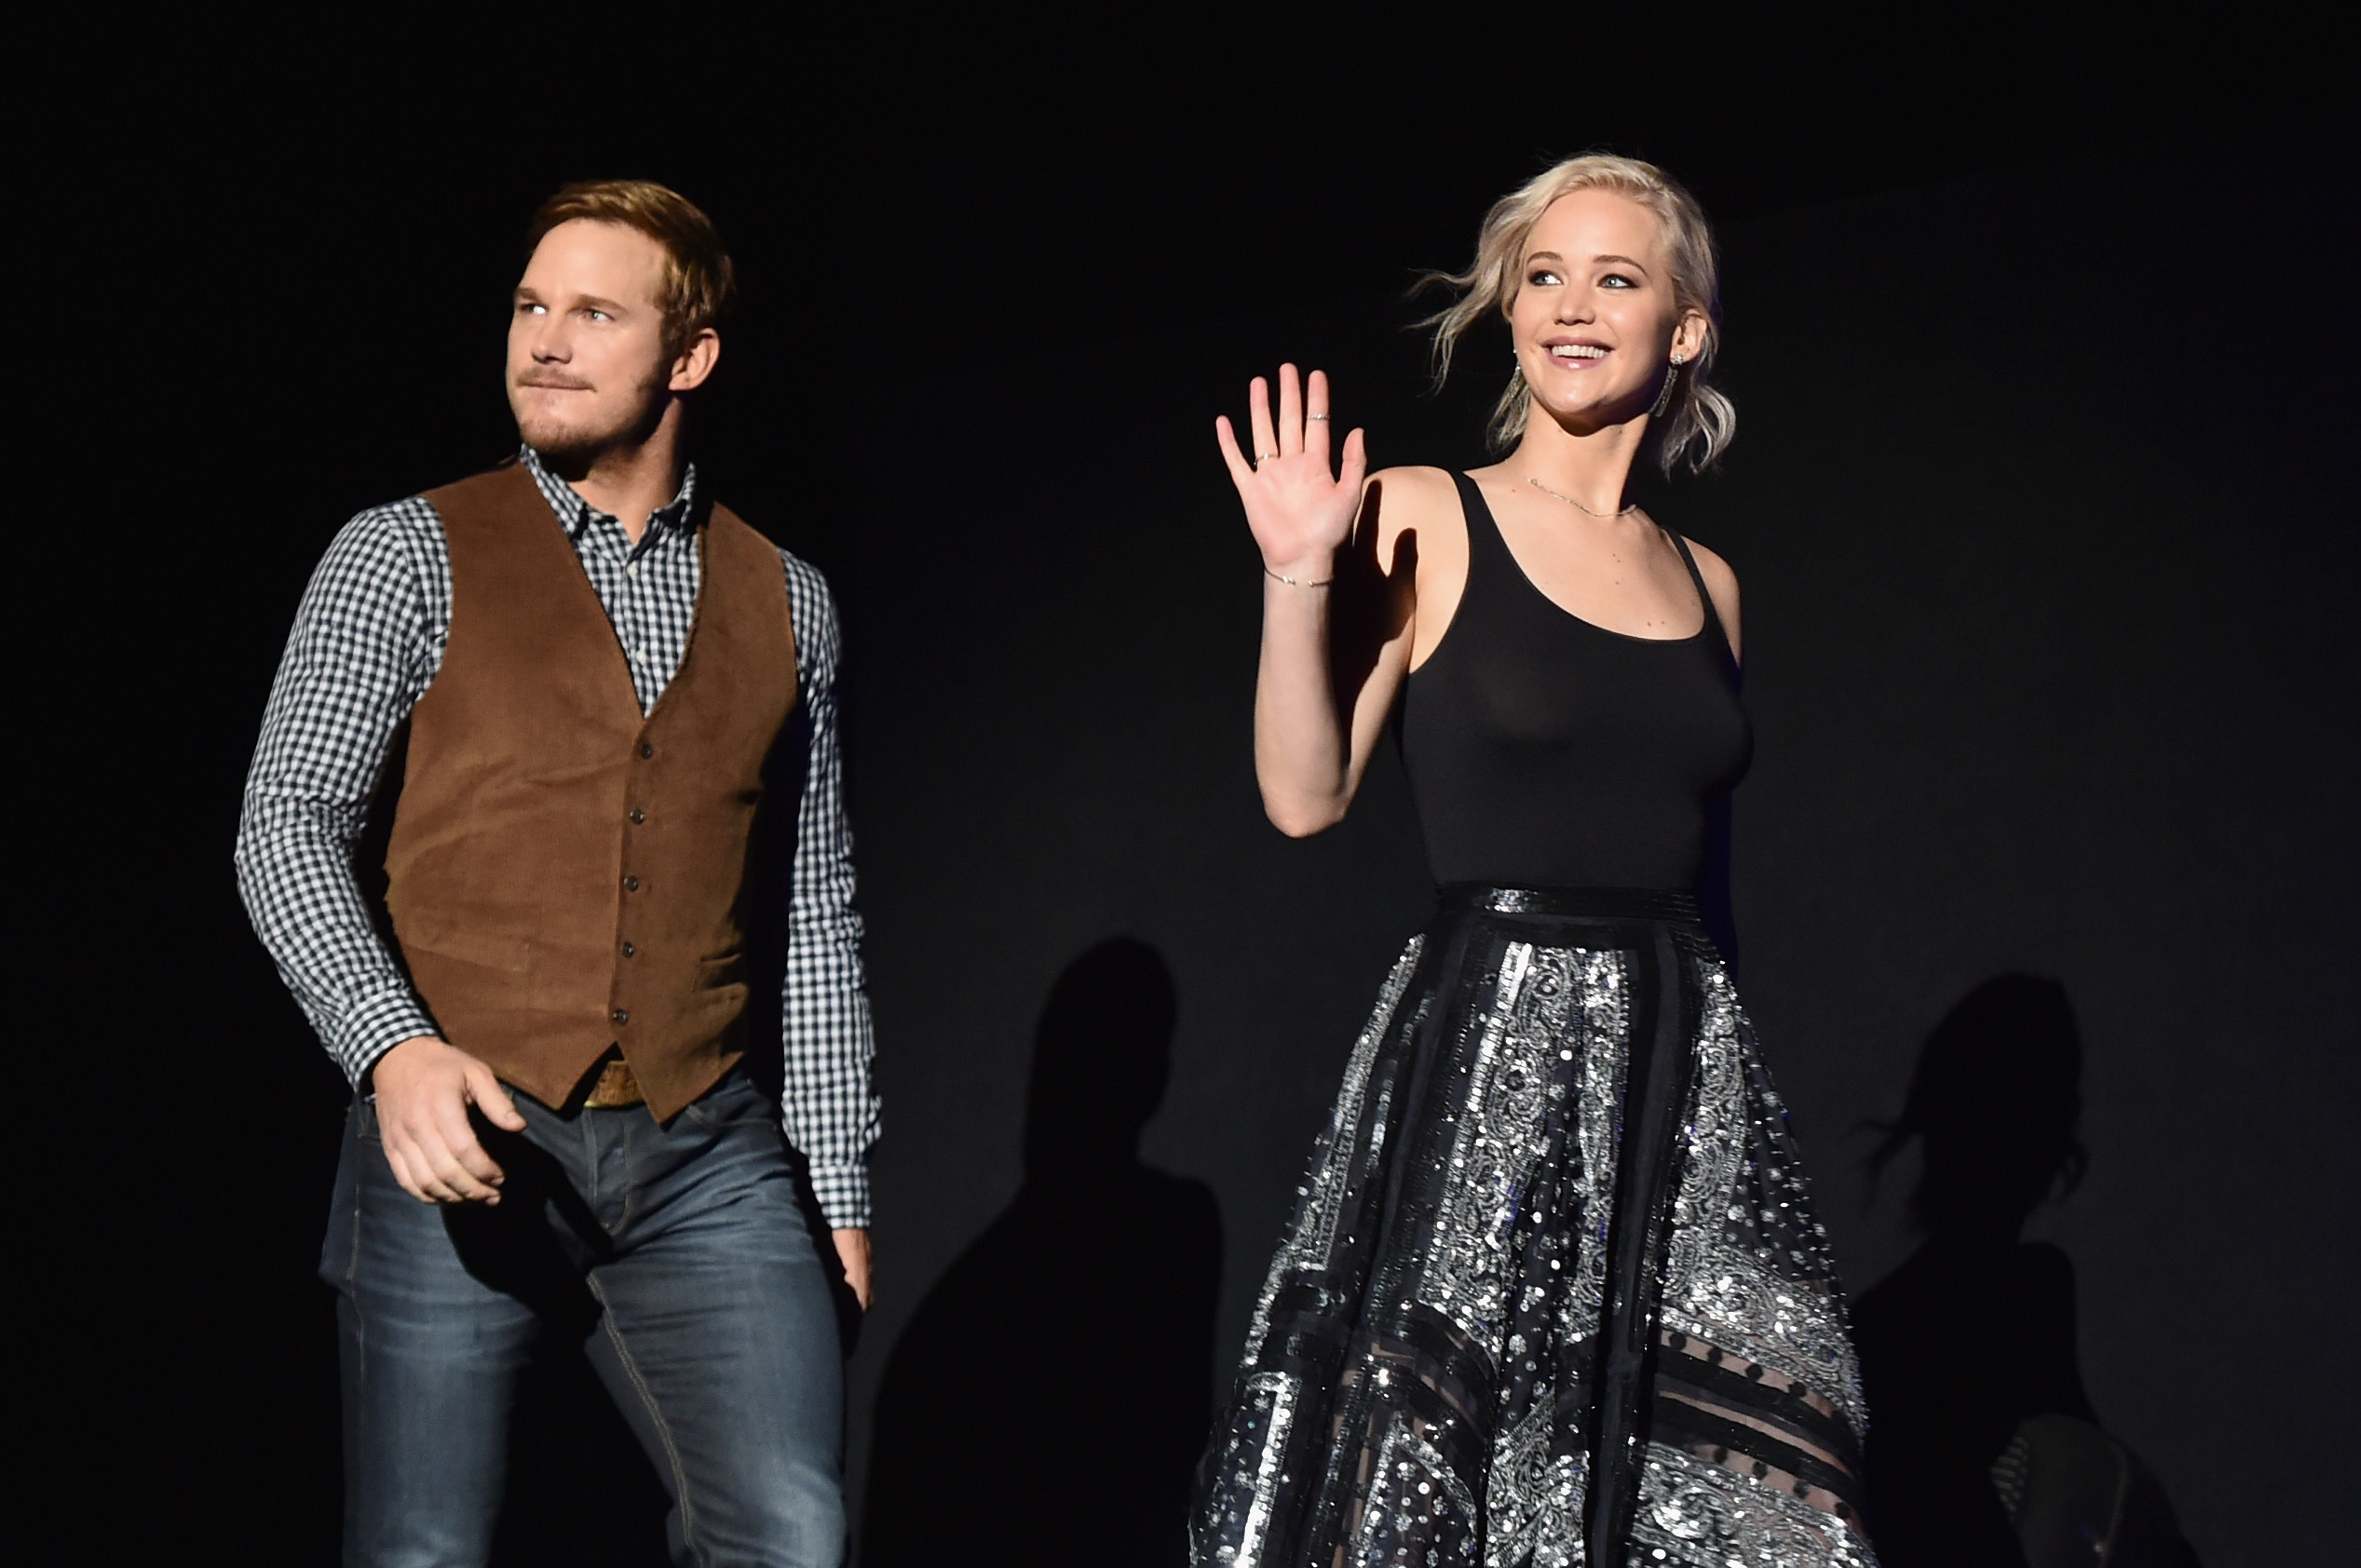 Jennifer Lawrence and Chris Pratt at CinemaCon in Las Vegas, Nevada.